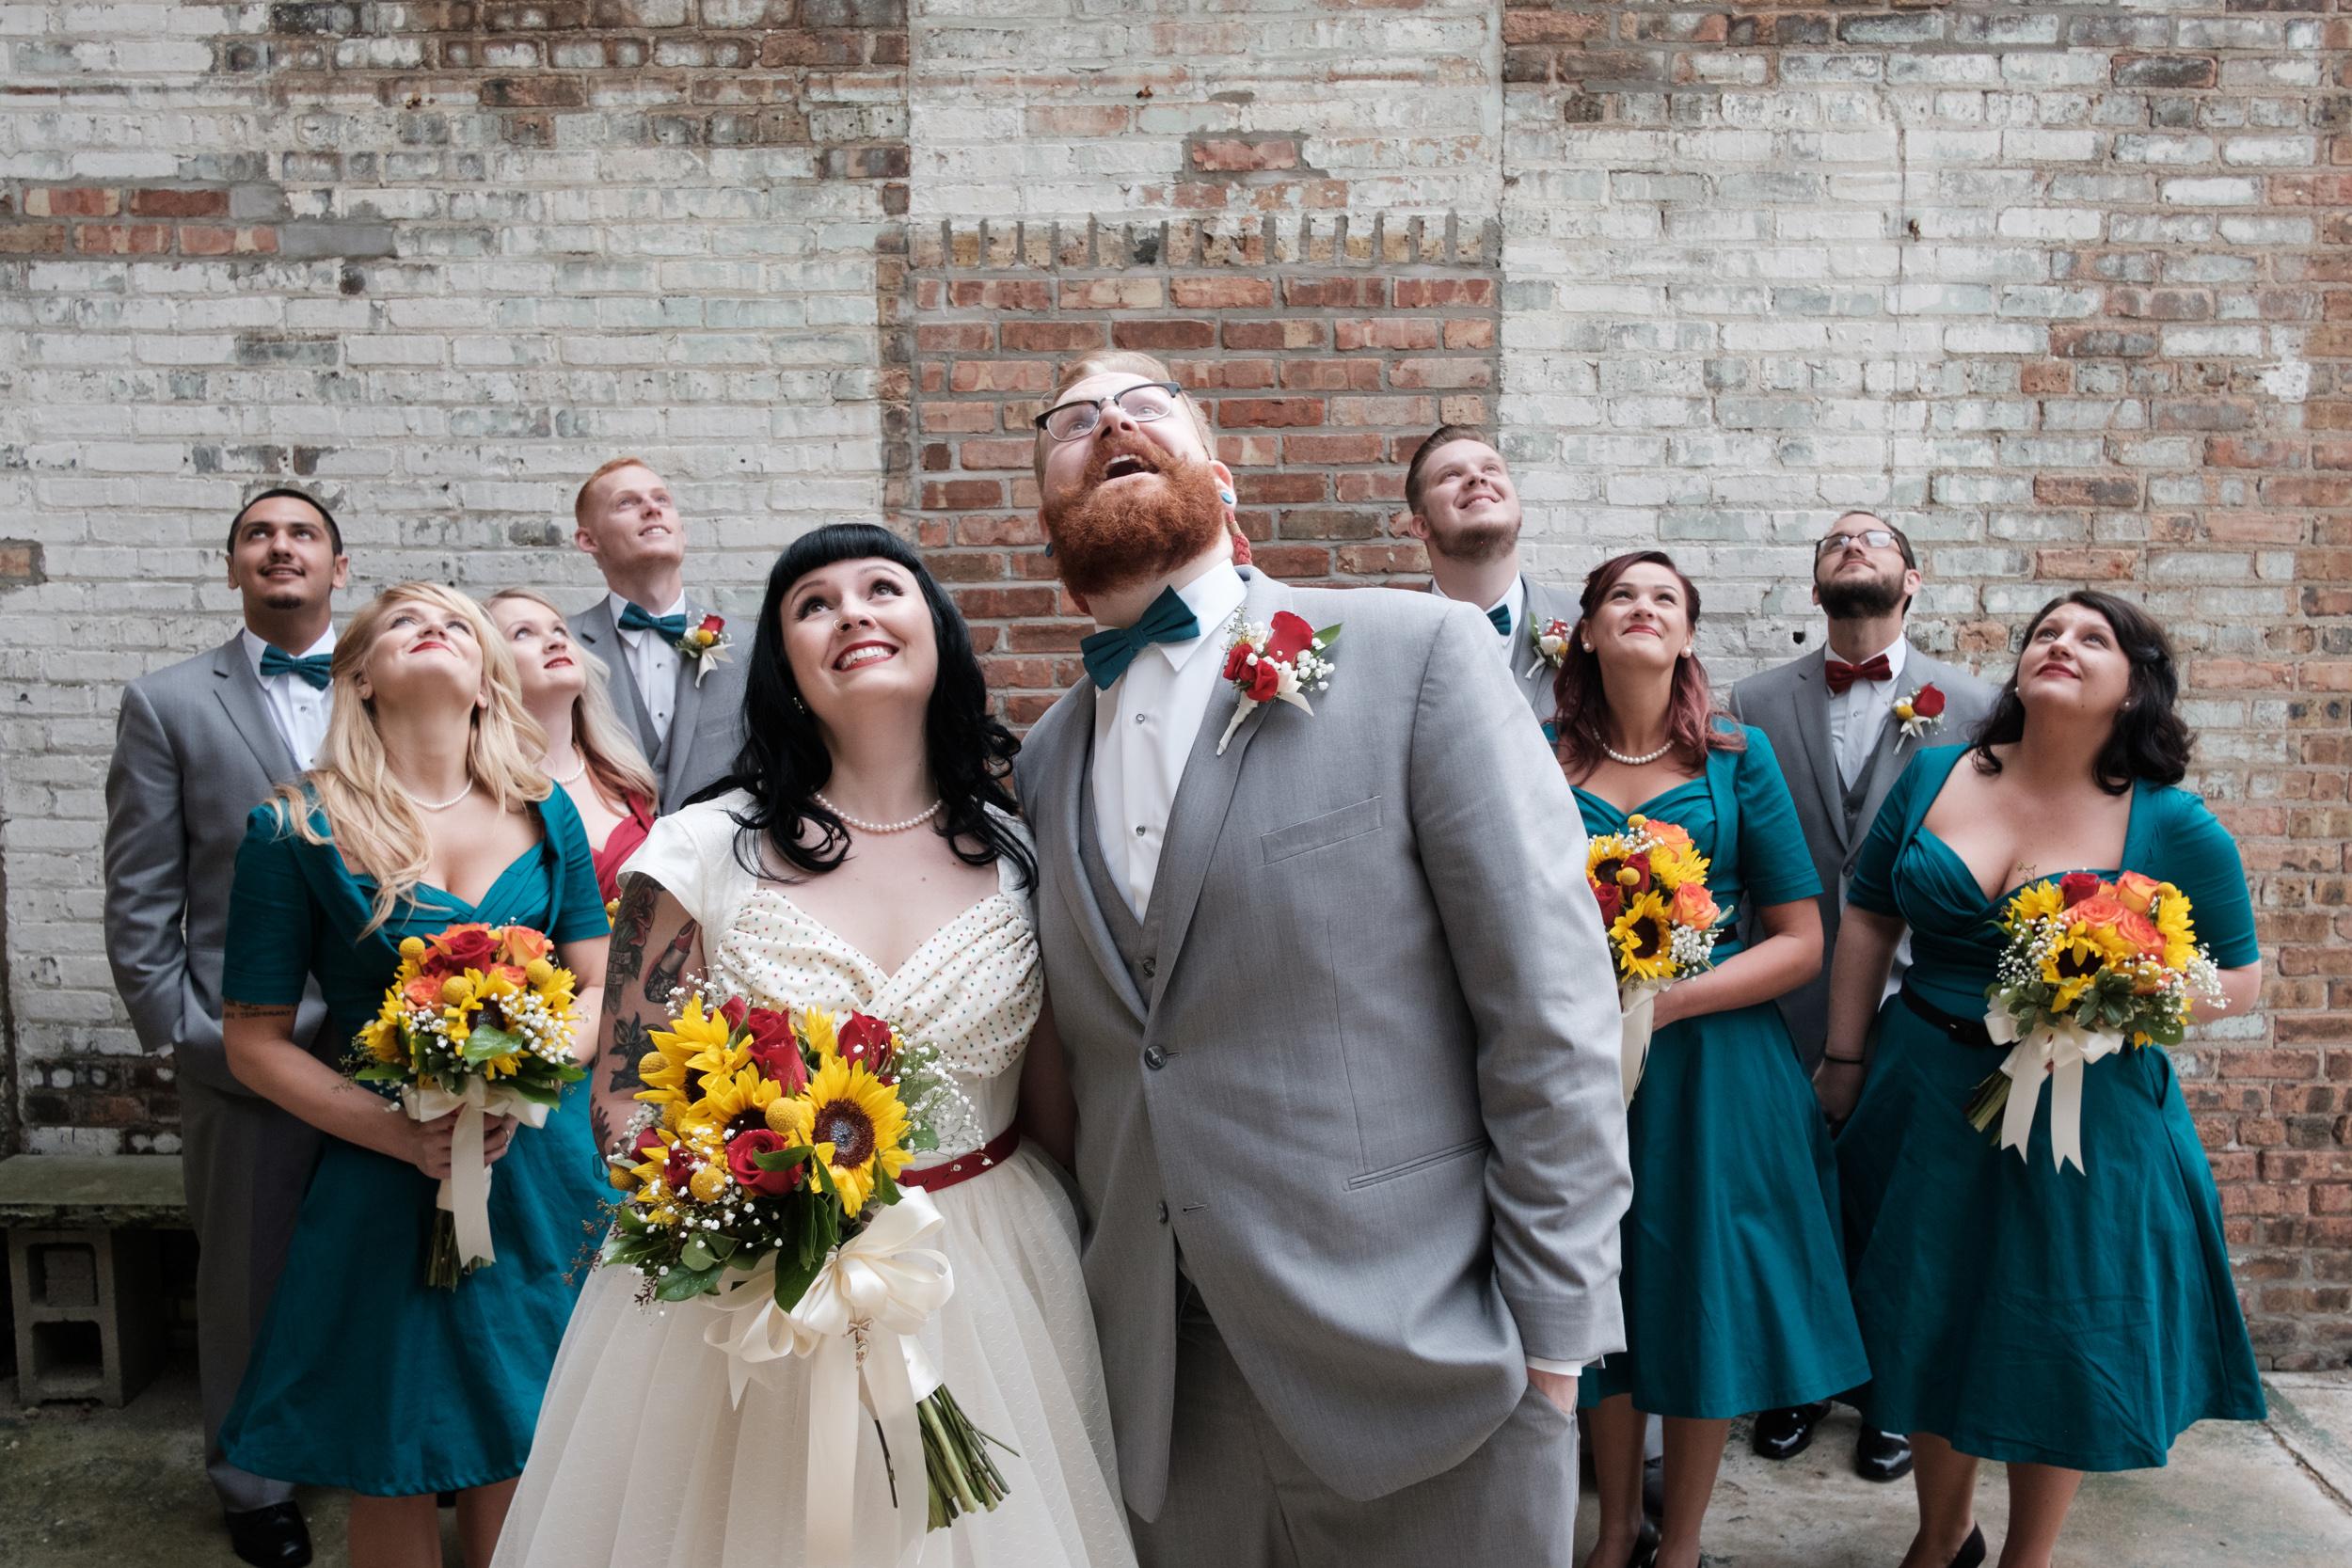 Christian & Sarah wedding photography by Brian milo-193.jpg